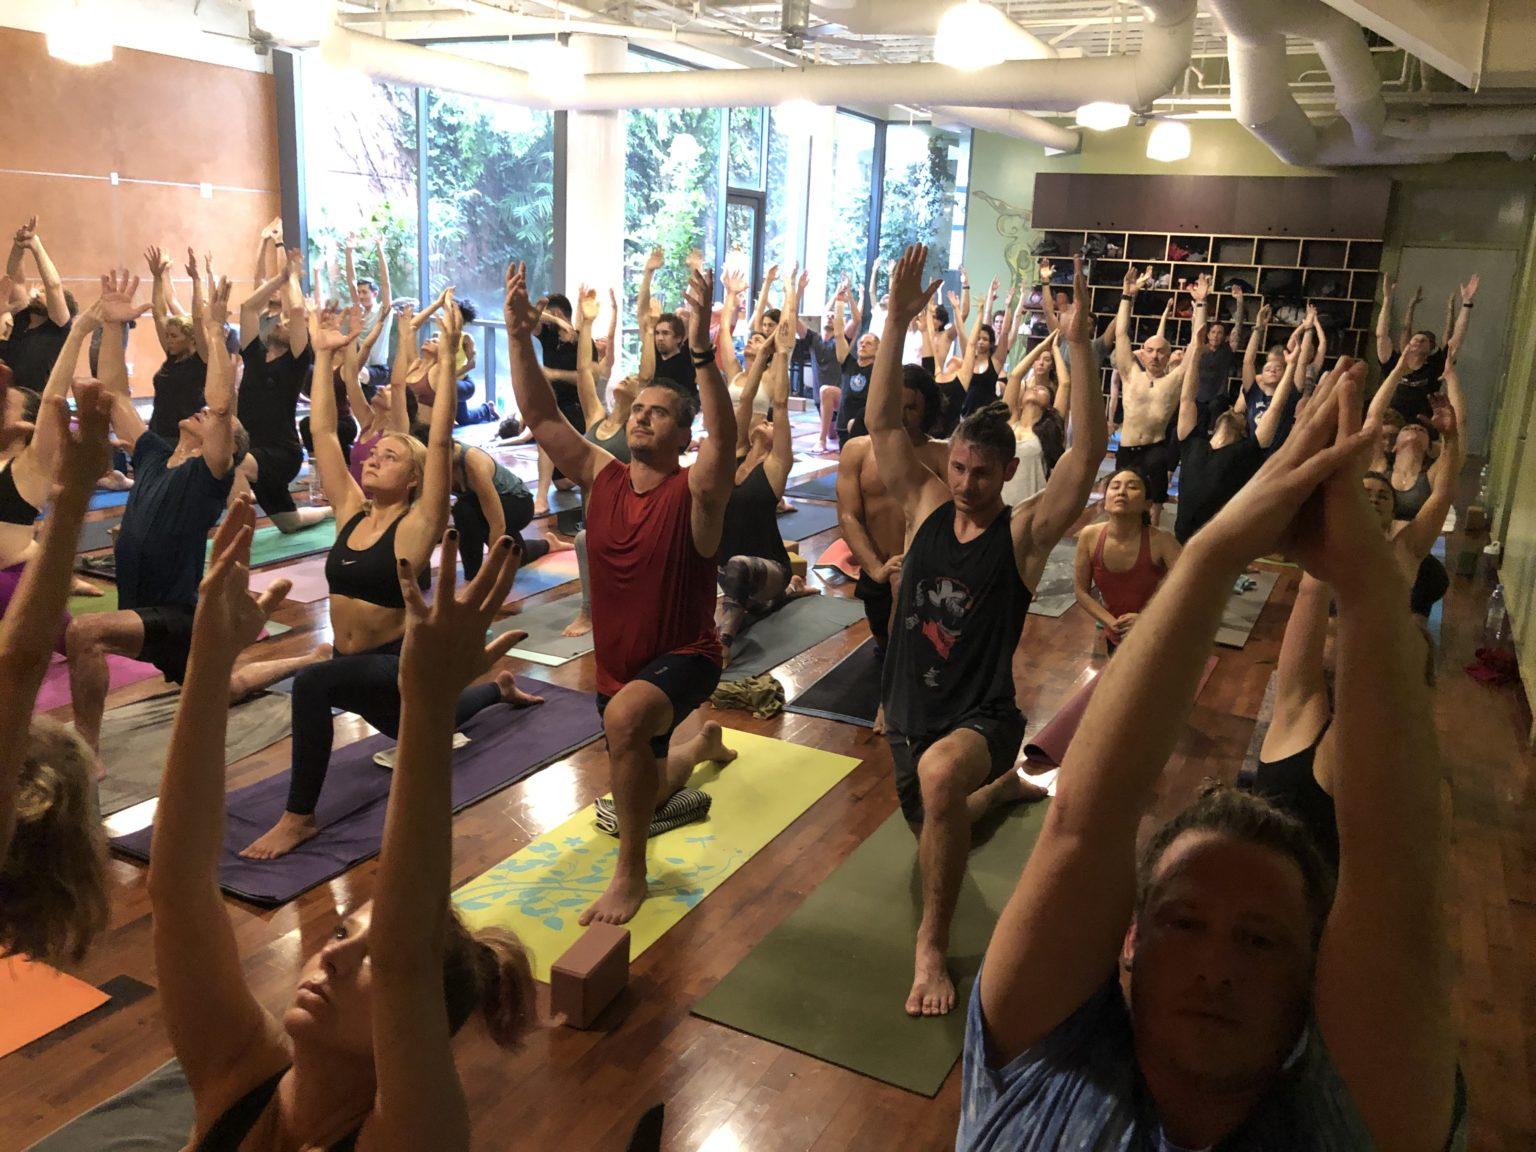 Yoga class doing lunge